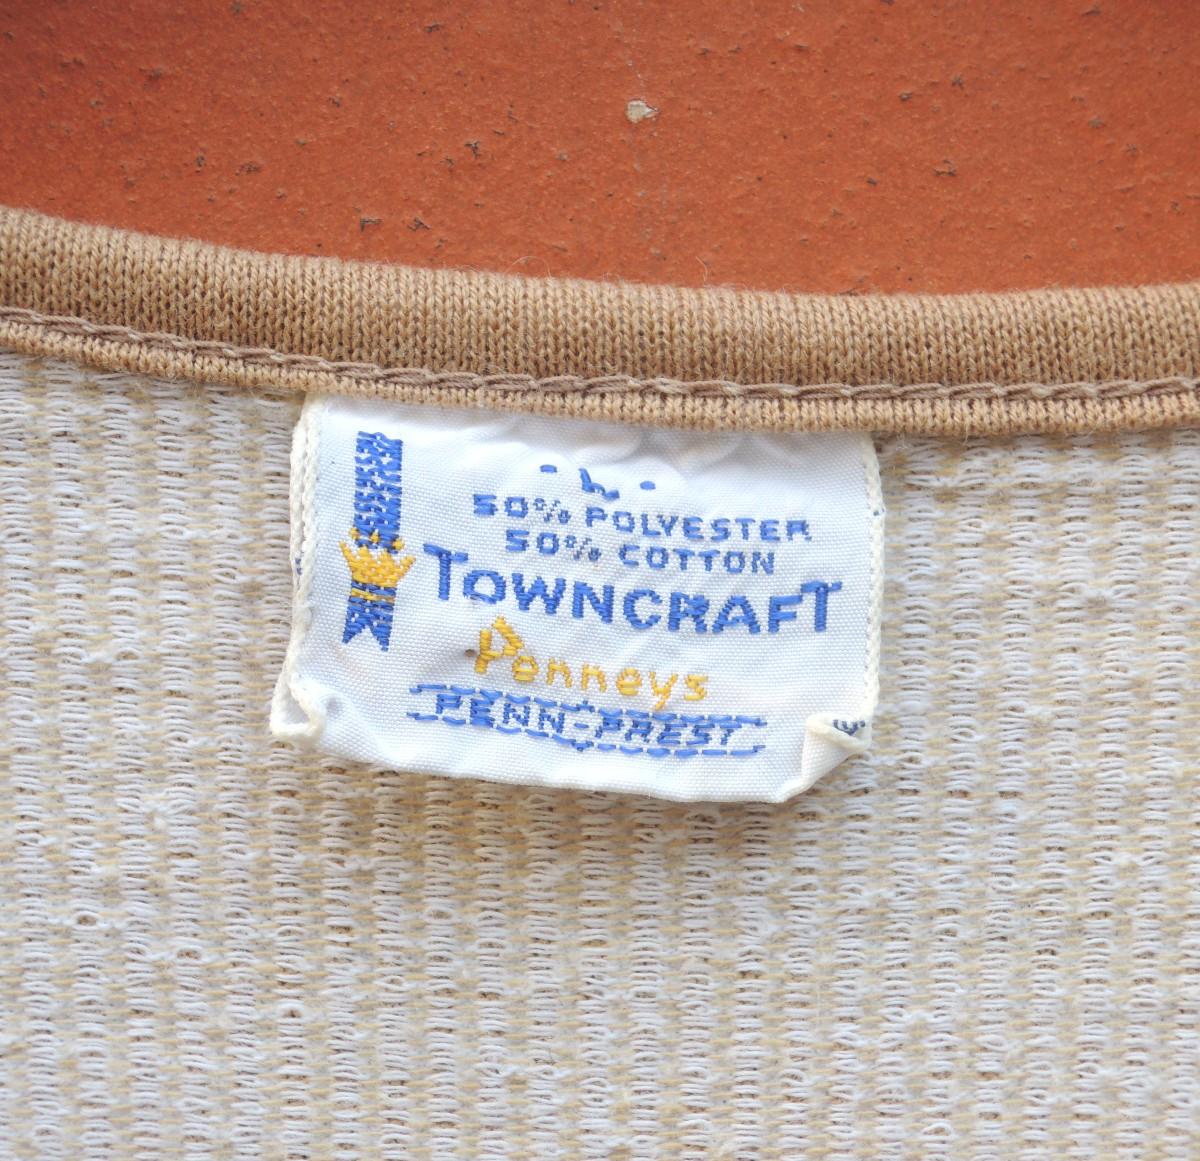 towncrafttshirts03.JPG